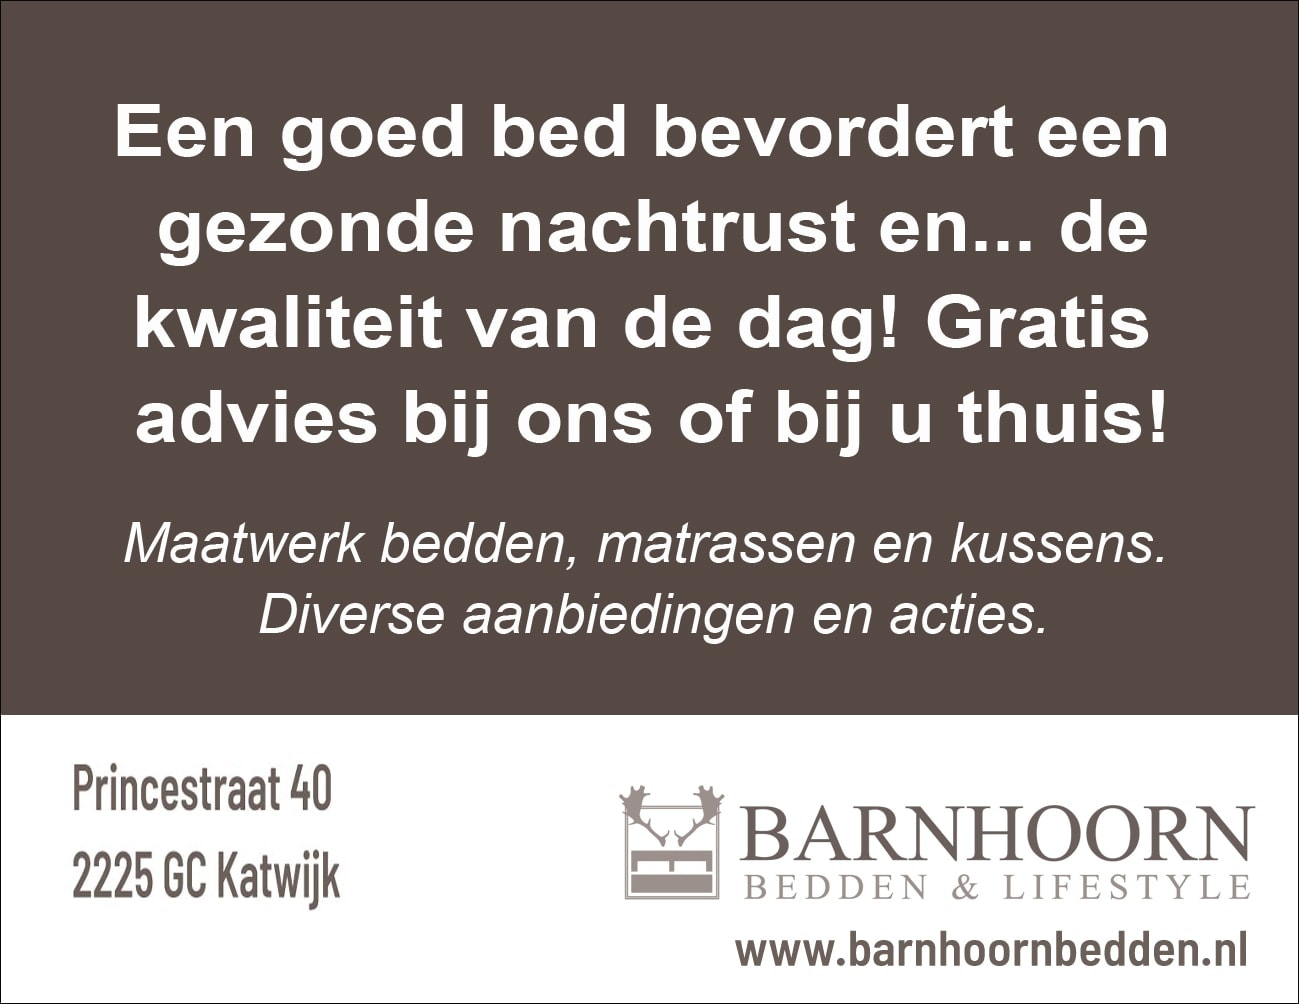 Barnhoorn_zorg 3